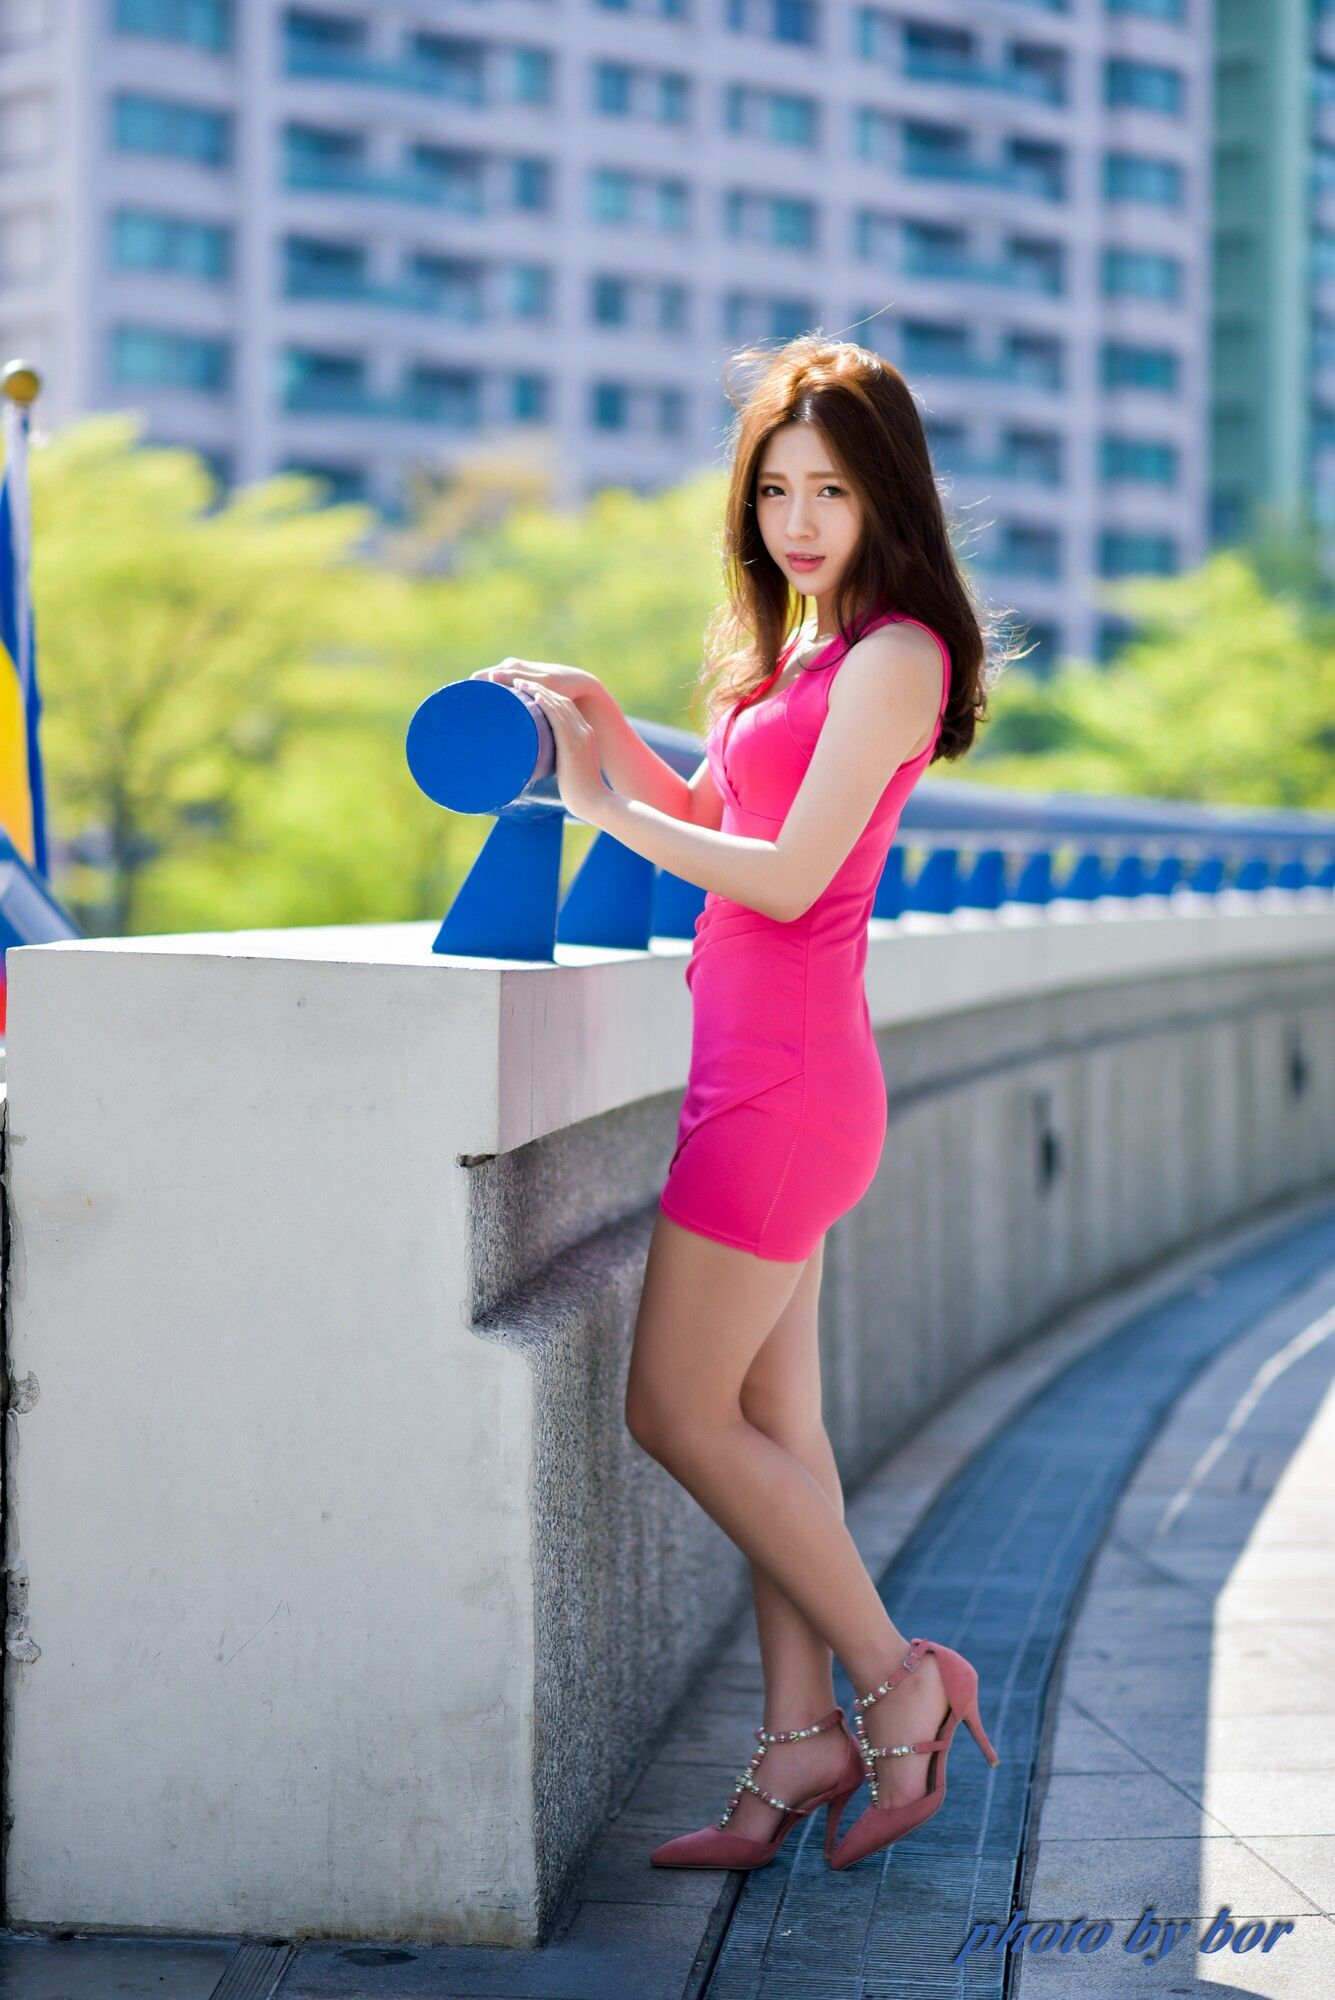 VOL.1245 [台湾正妹]清新阳光正妹街拍短裙:胡安绮(Chichy胡绮)超高清个人性感漂亮大图(61P)